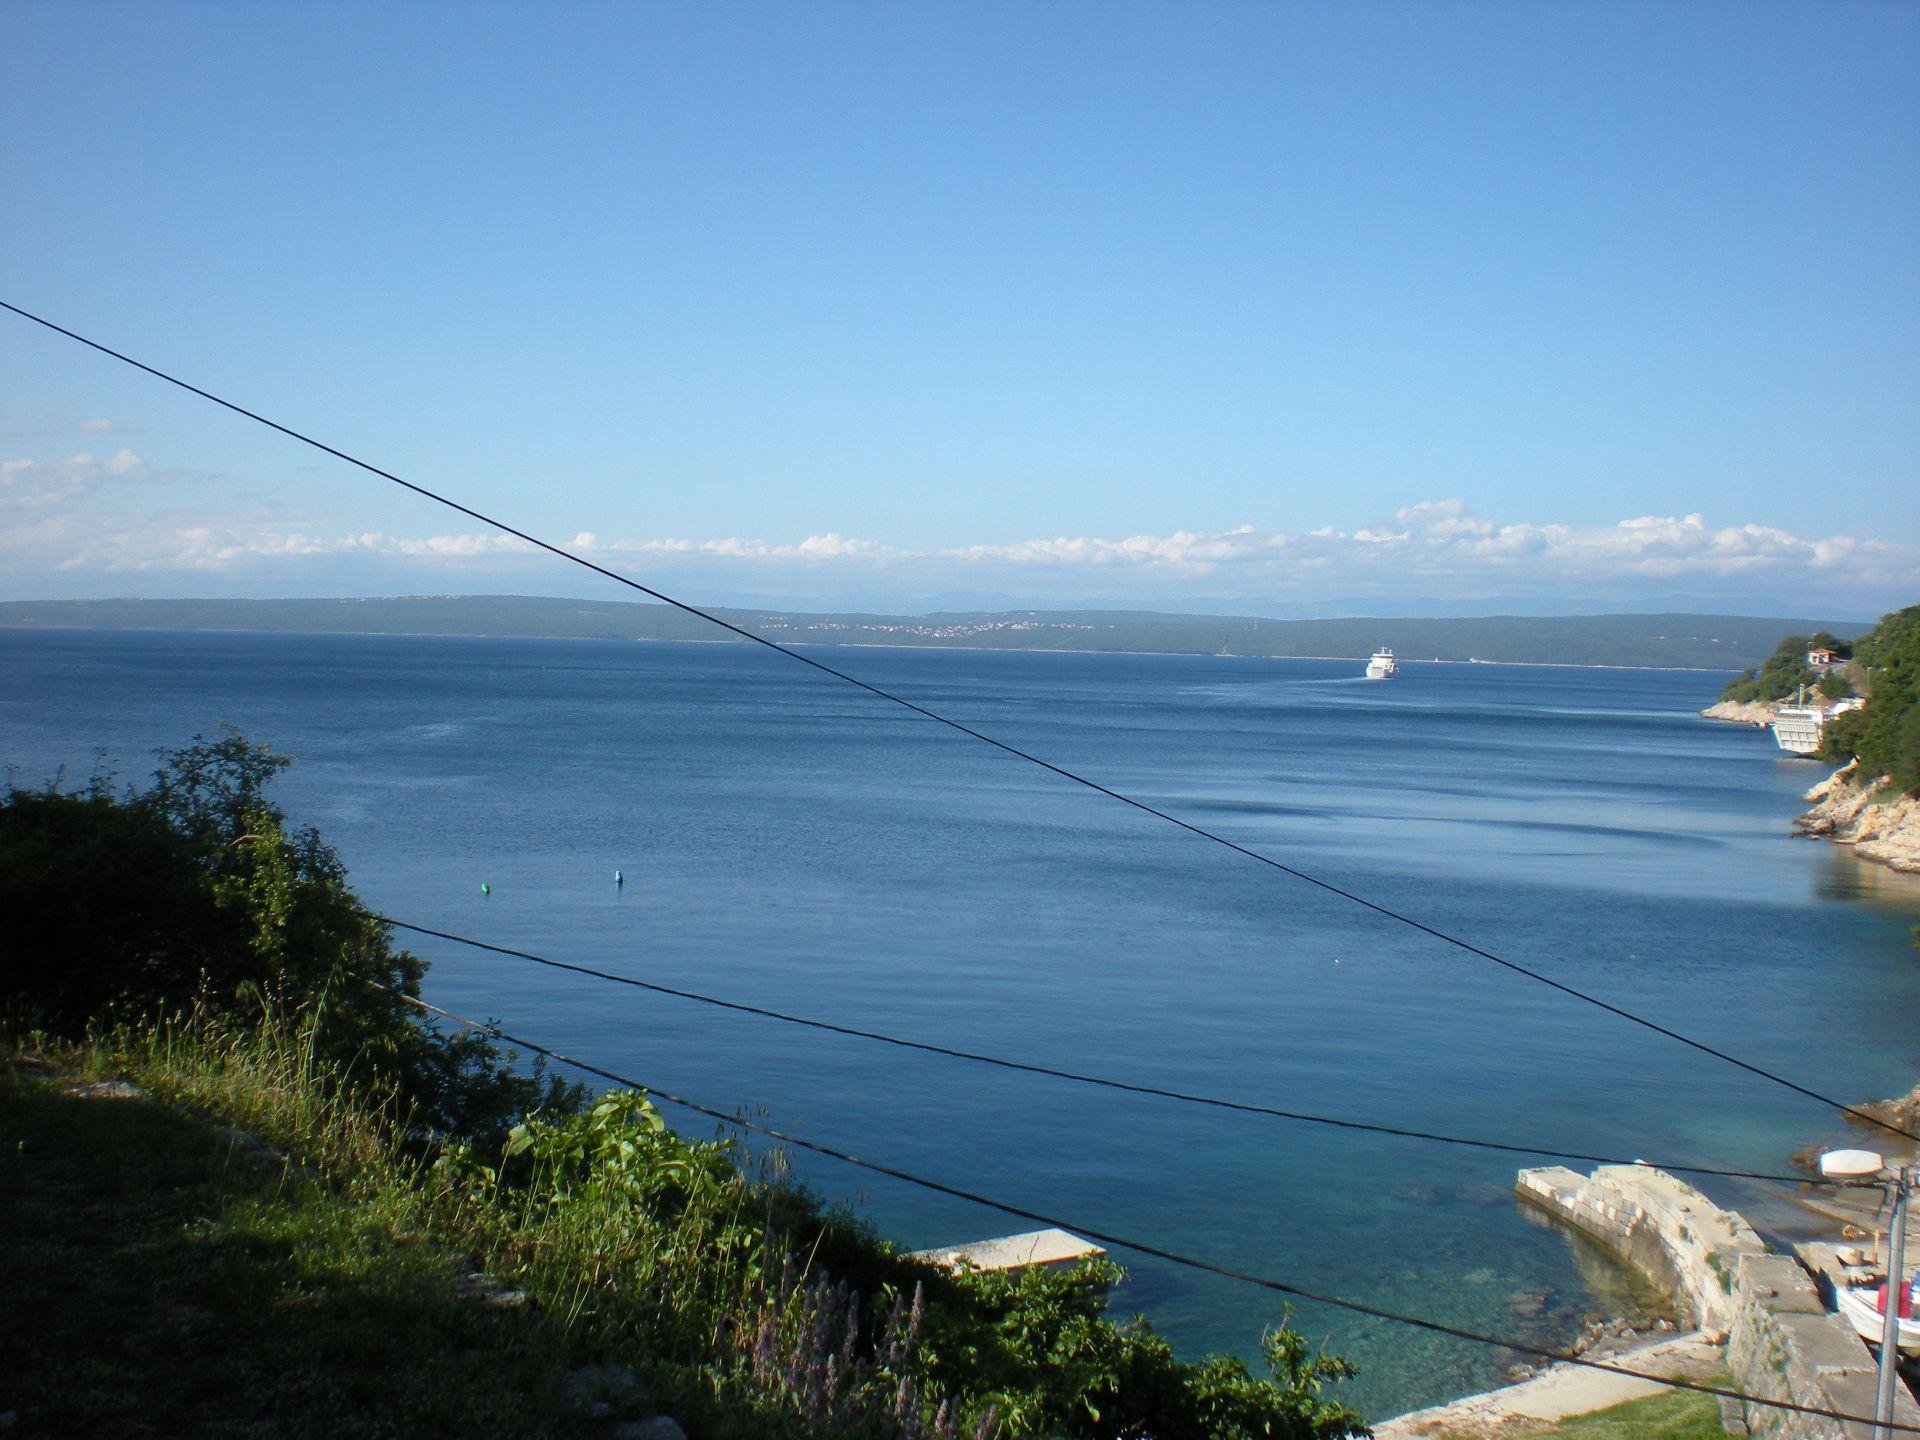 Appartement de vacances BT A2(4) - Merag (769321), Merag, Île de Cres, Kvarner, Croatie, image 7